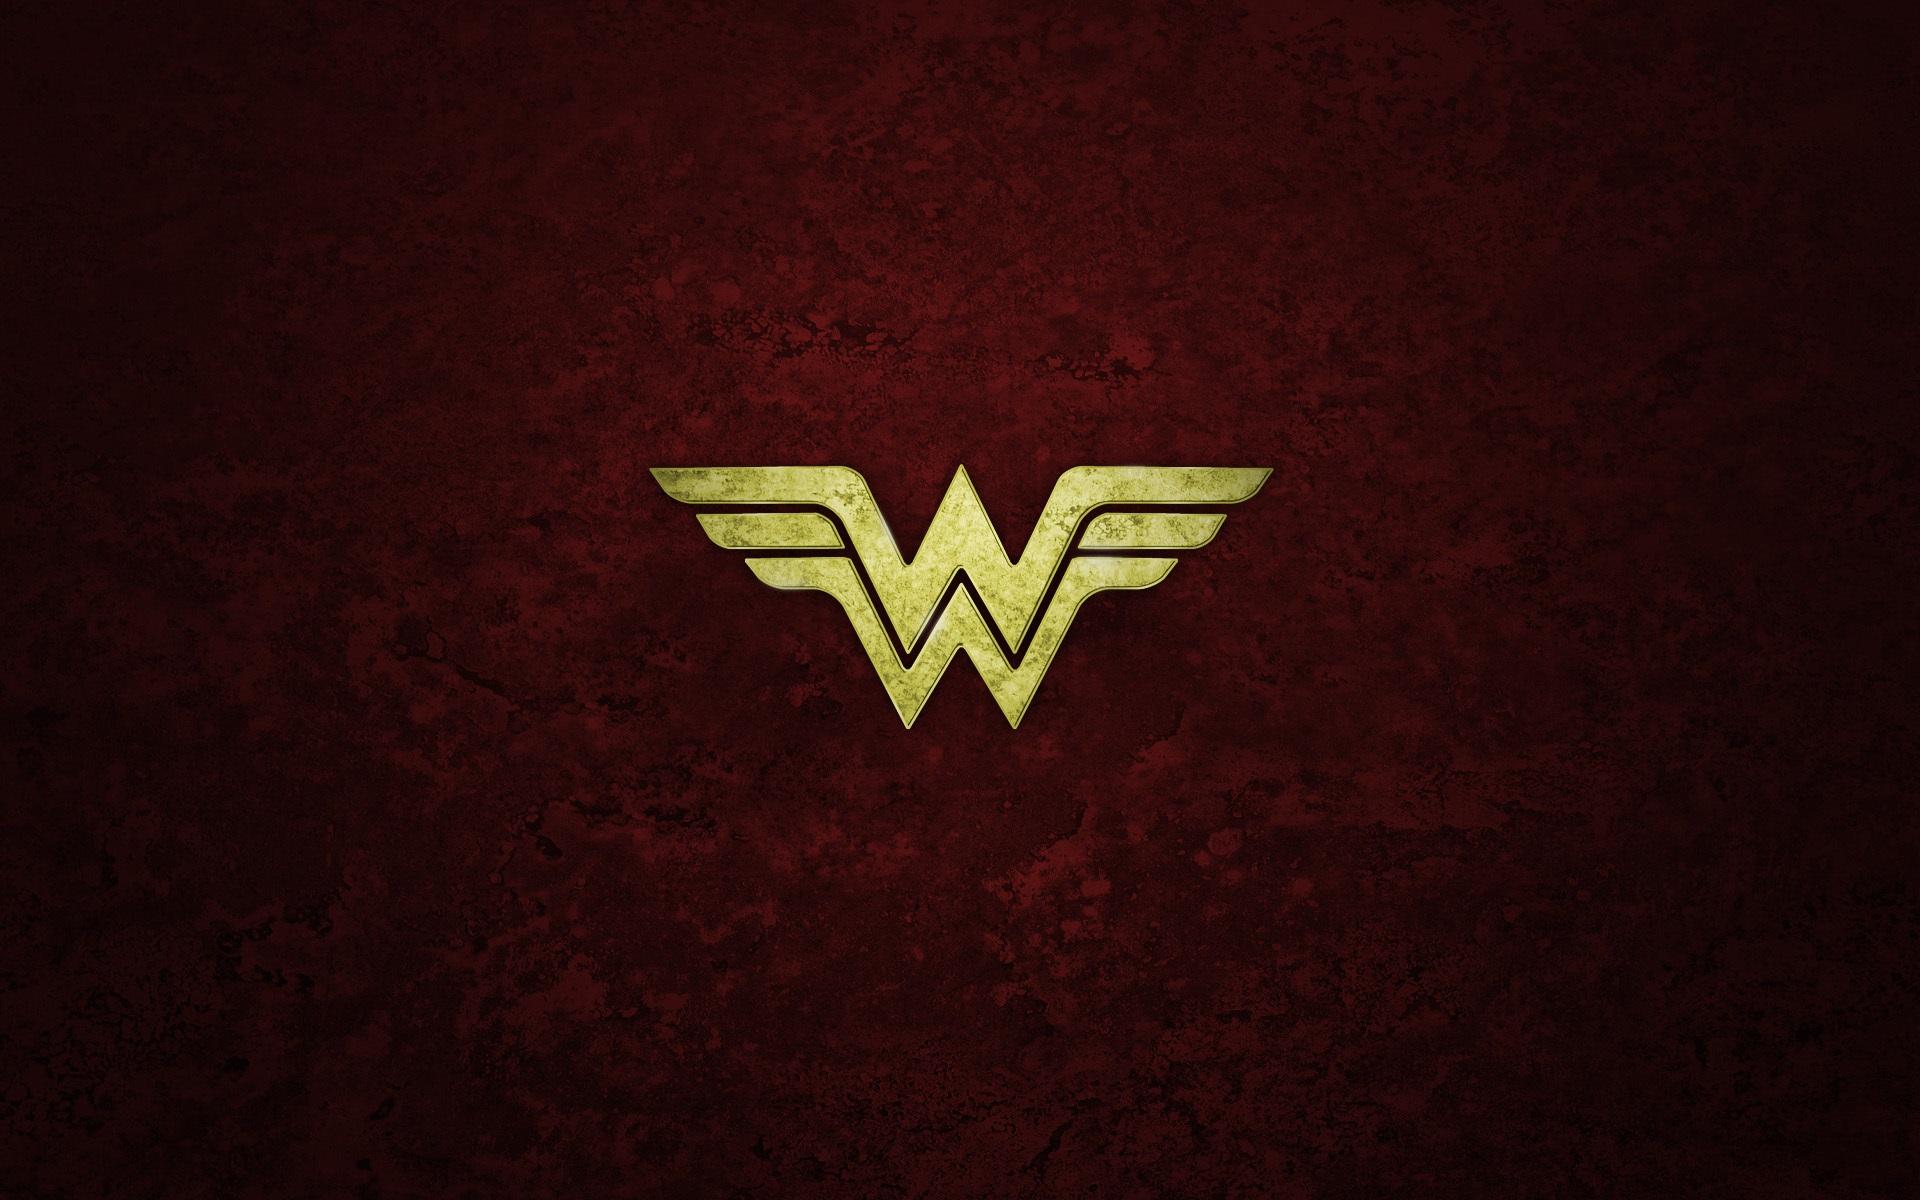 Superhero Hd Wallpapers Iphone Brainiac Jyger S Rant